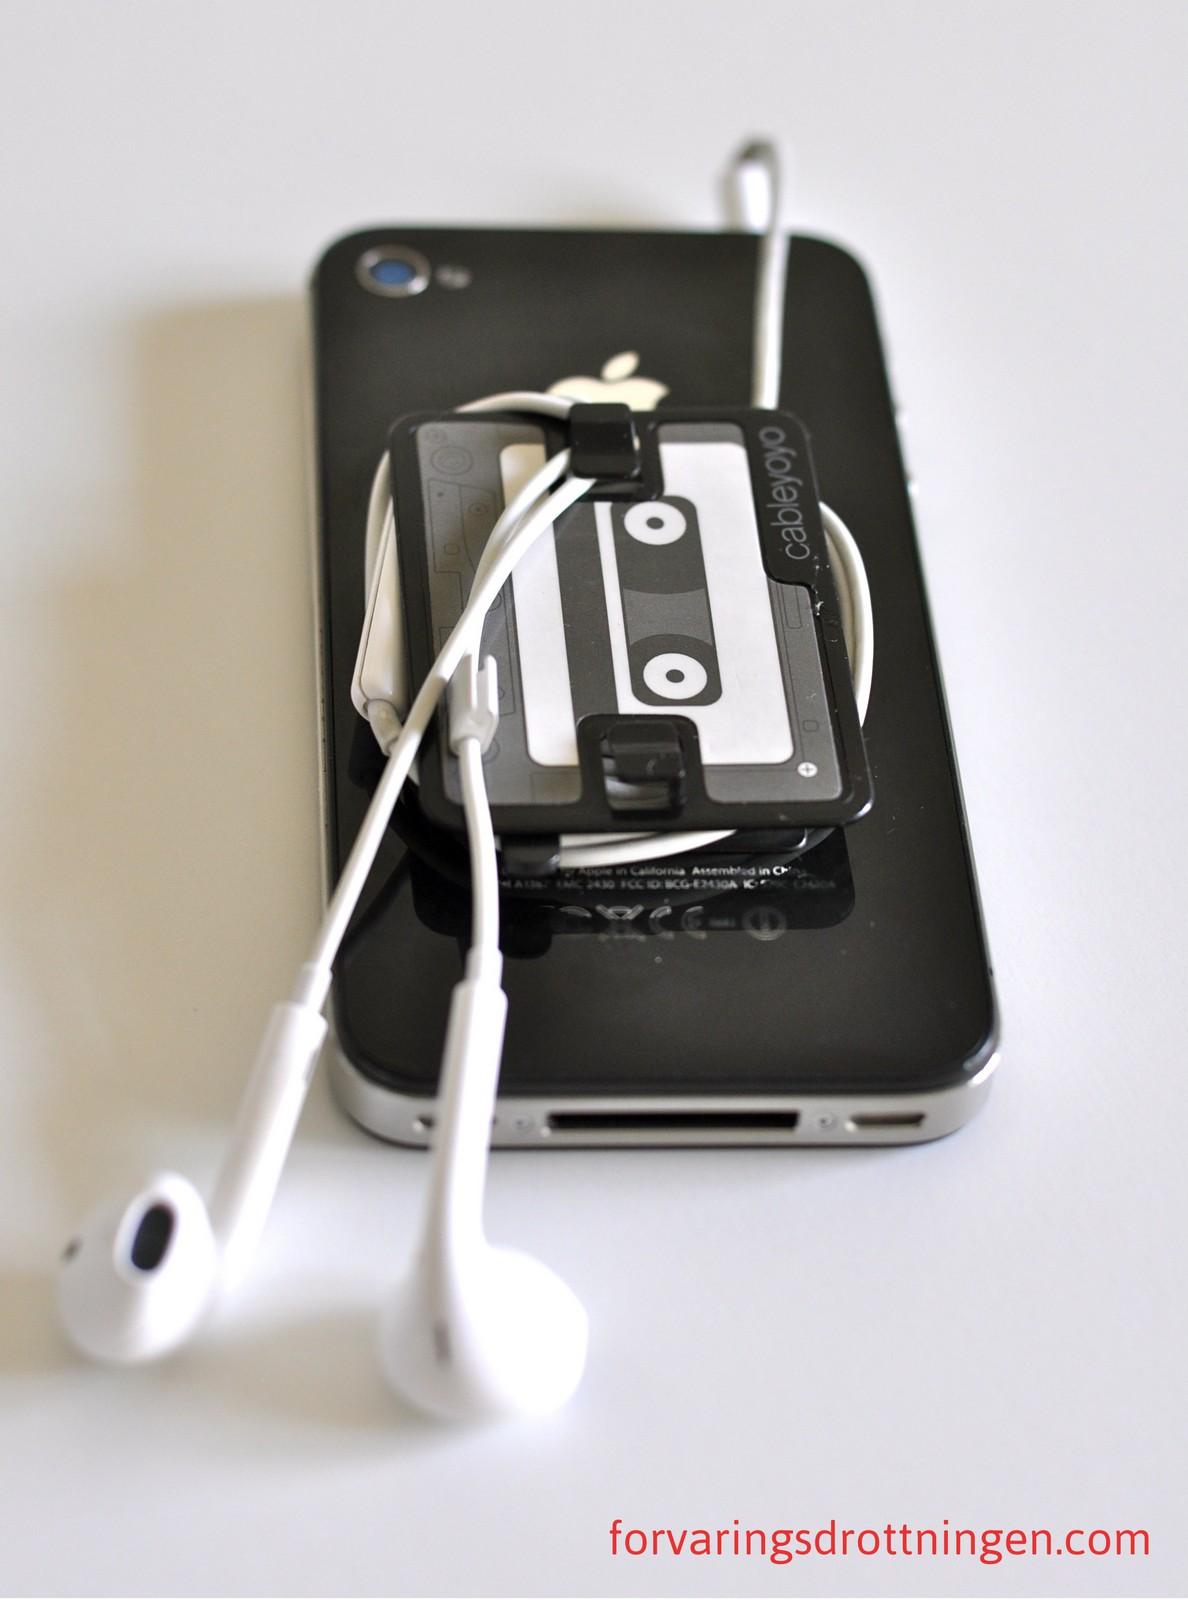 löser trassel bland hörlurar